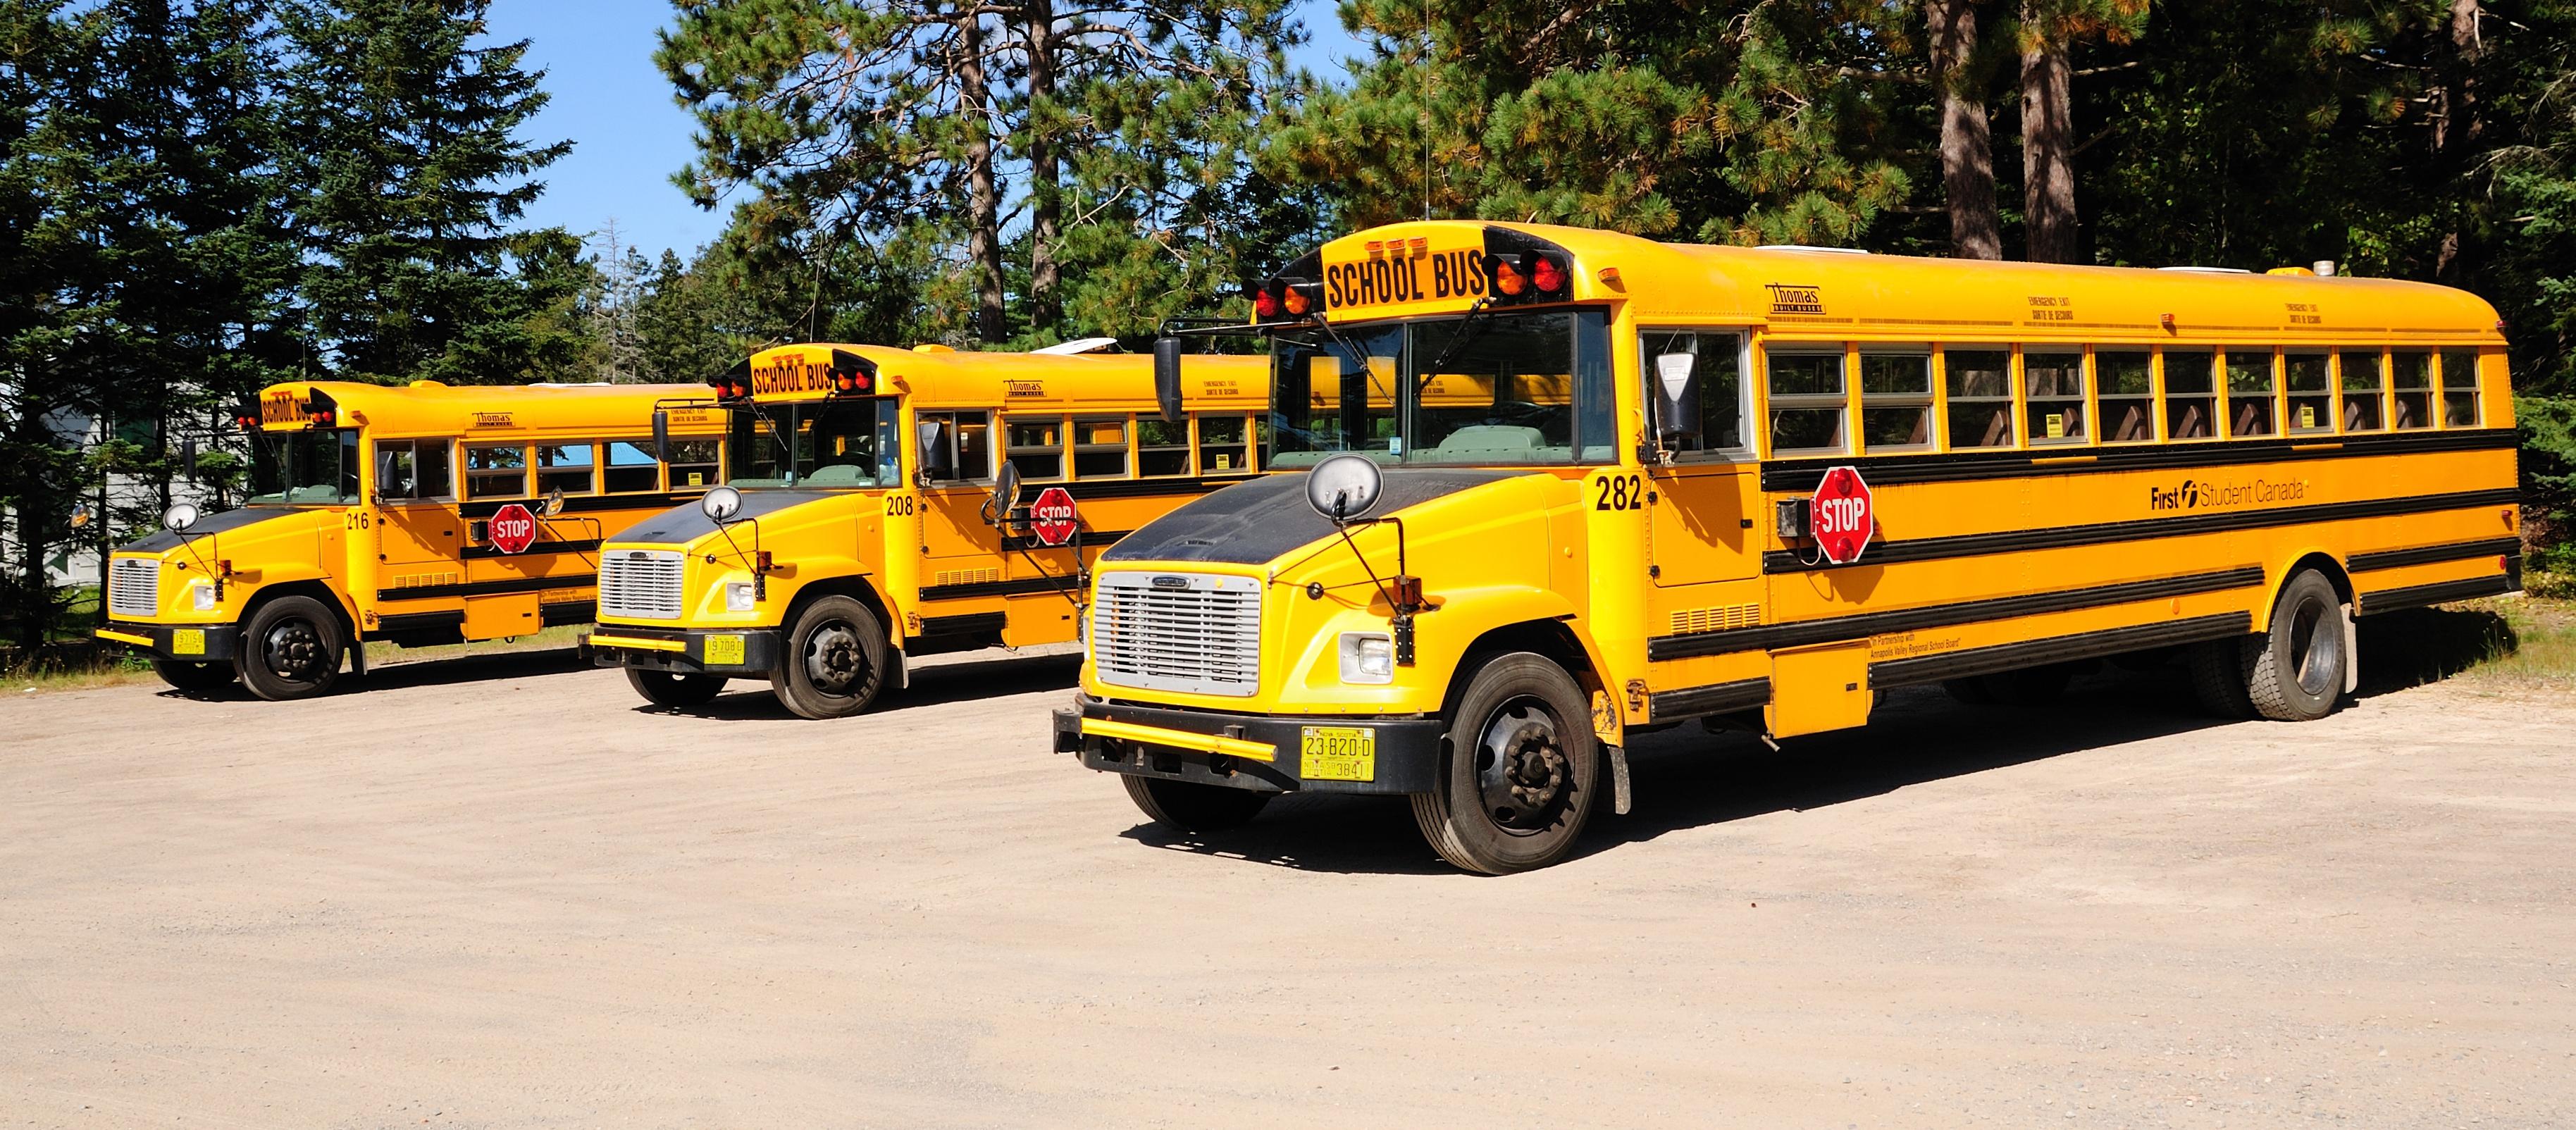 School Bus Car Wash Video